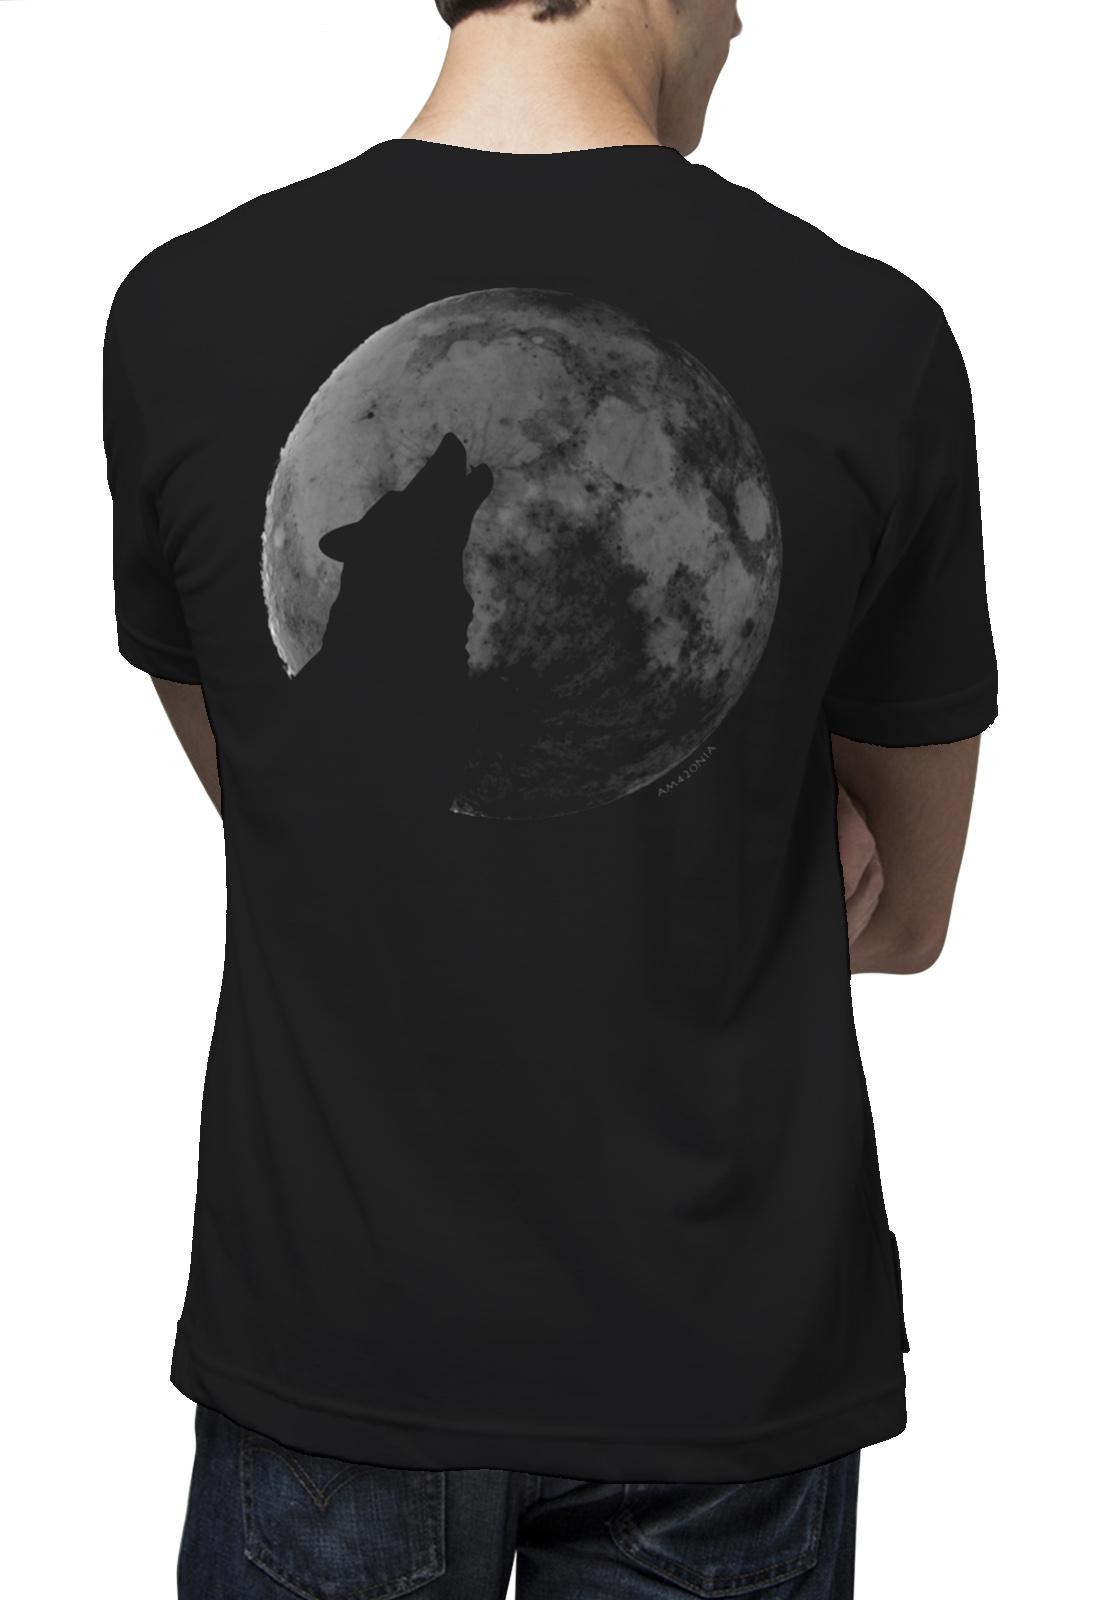 Camiseta Amazônia Lua Cheia - Preto